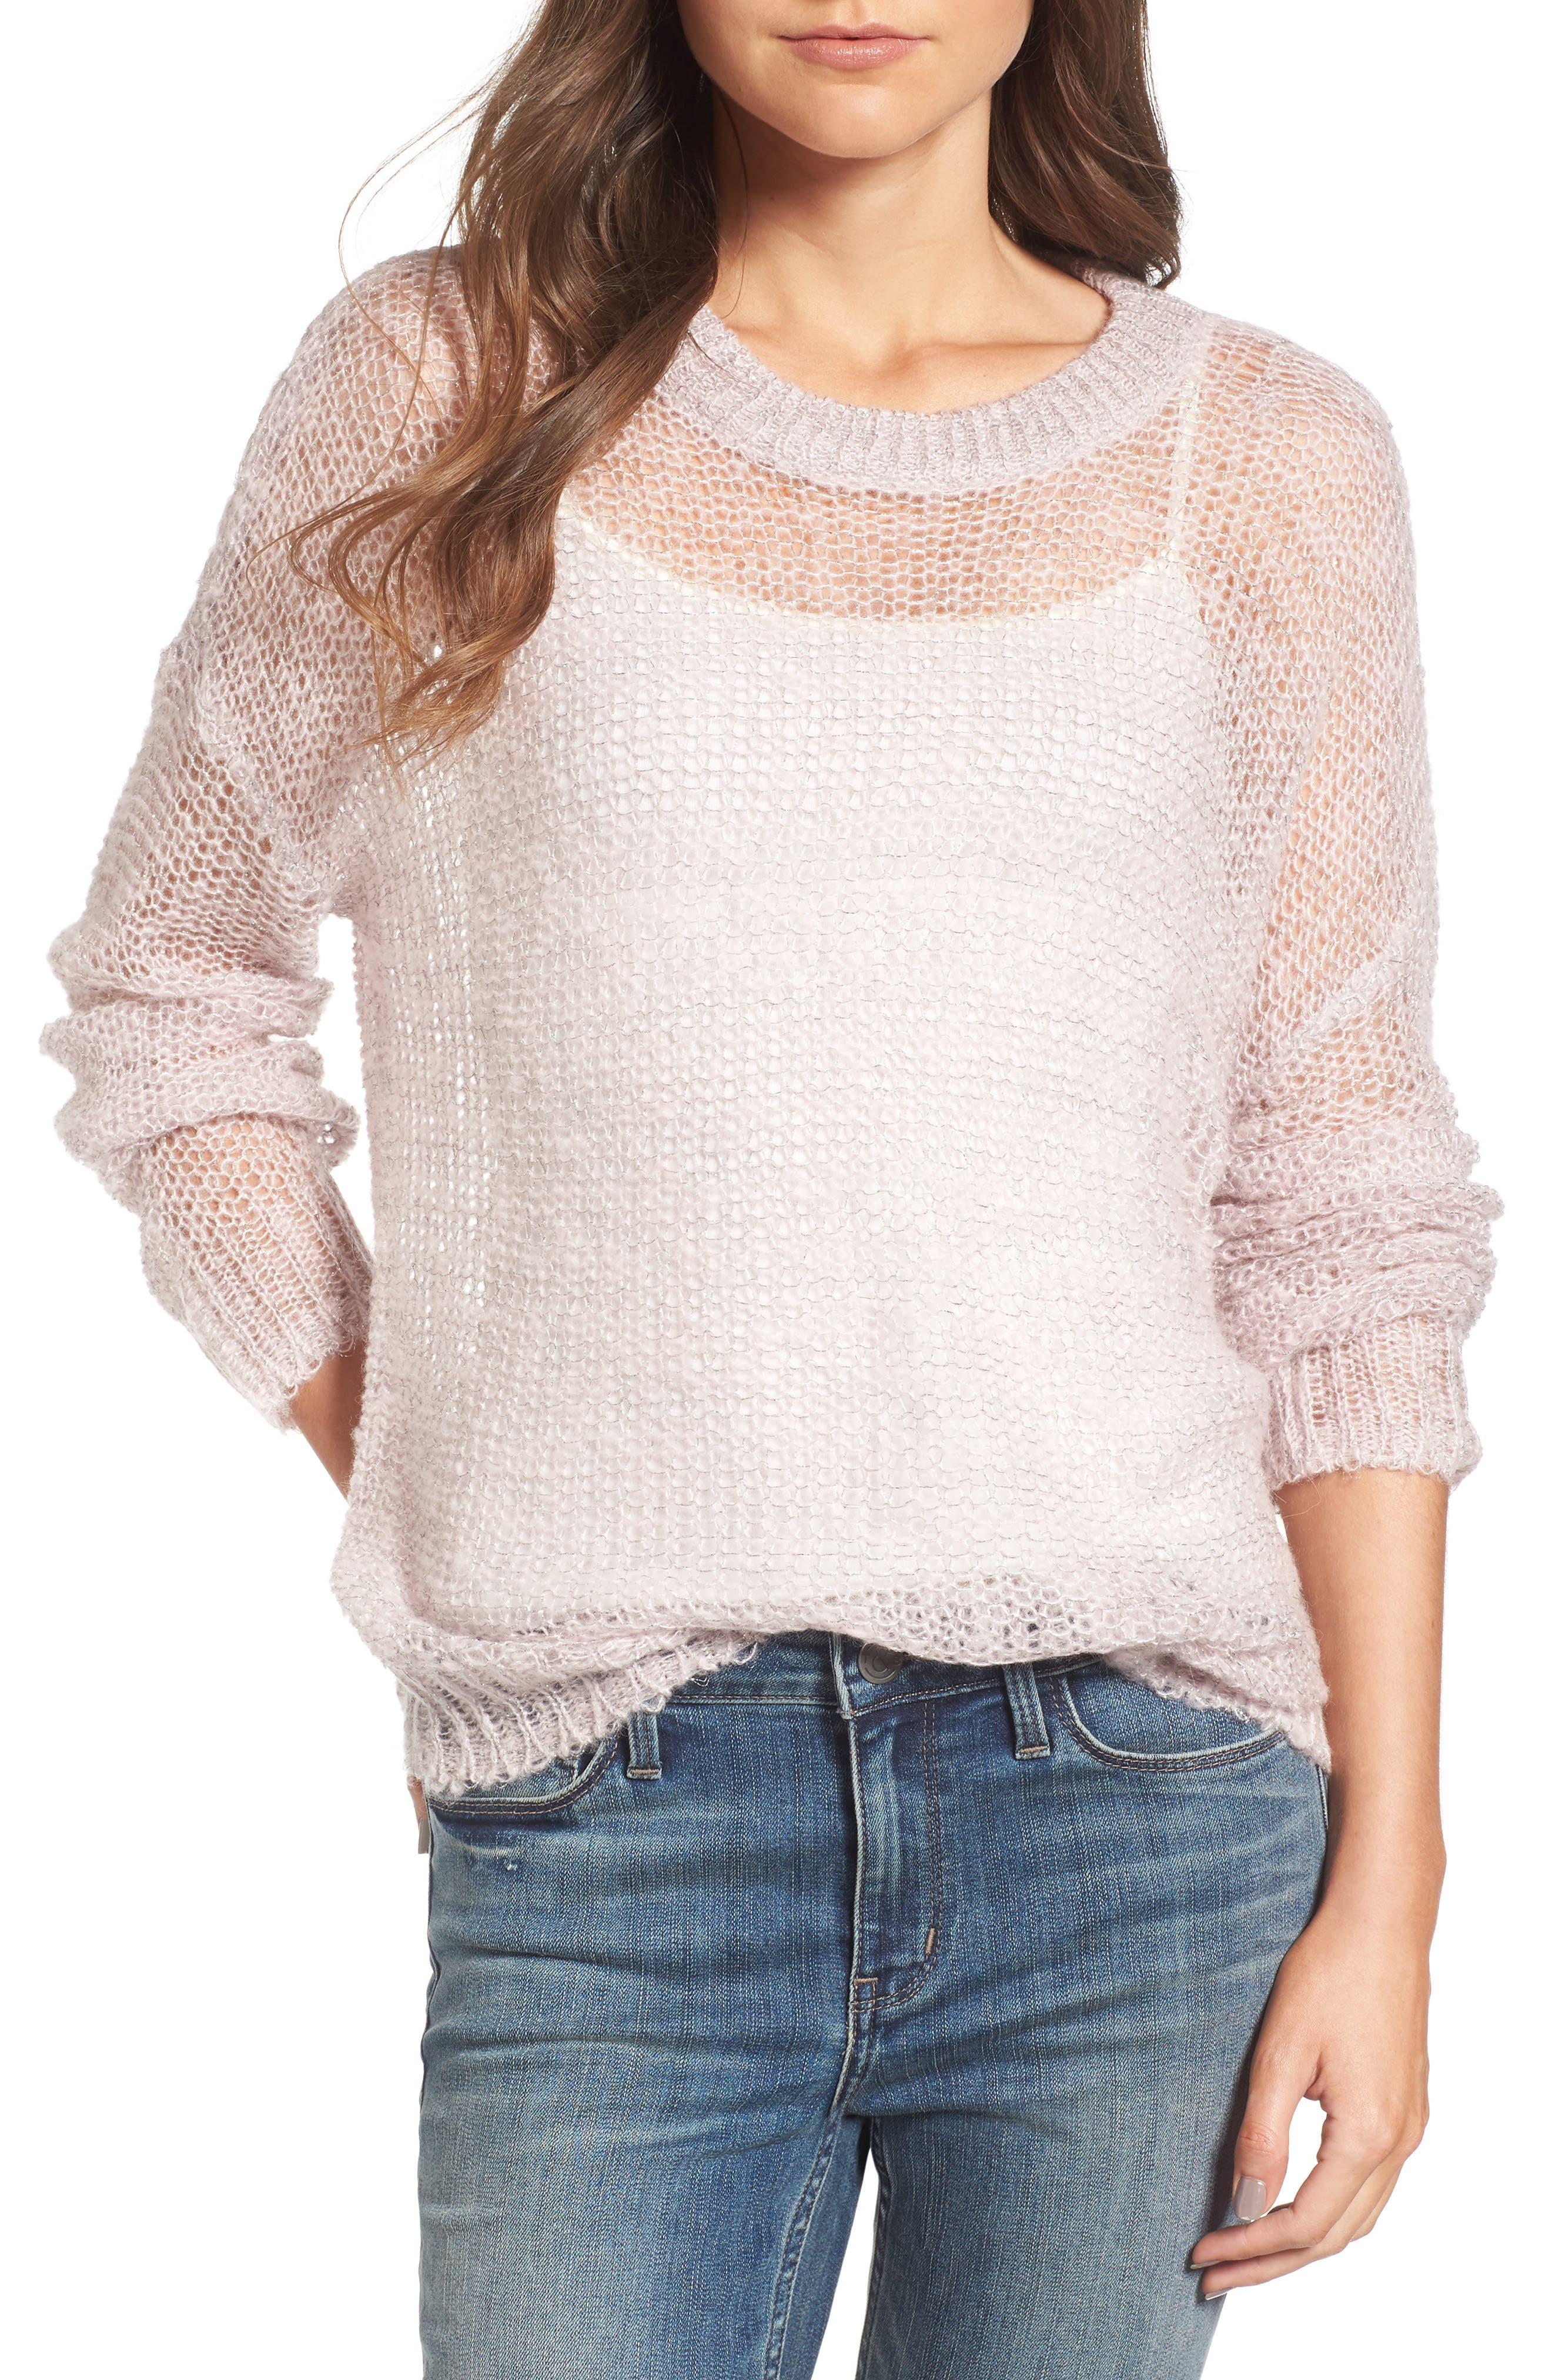 Alternate Image 1 Selected - Treasure & Bond x Something Navy Sheer Metallic Sweater